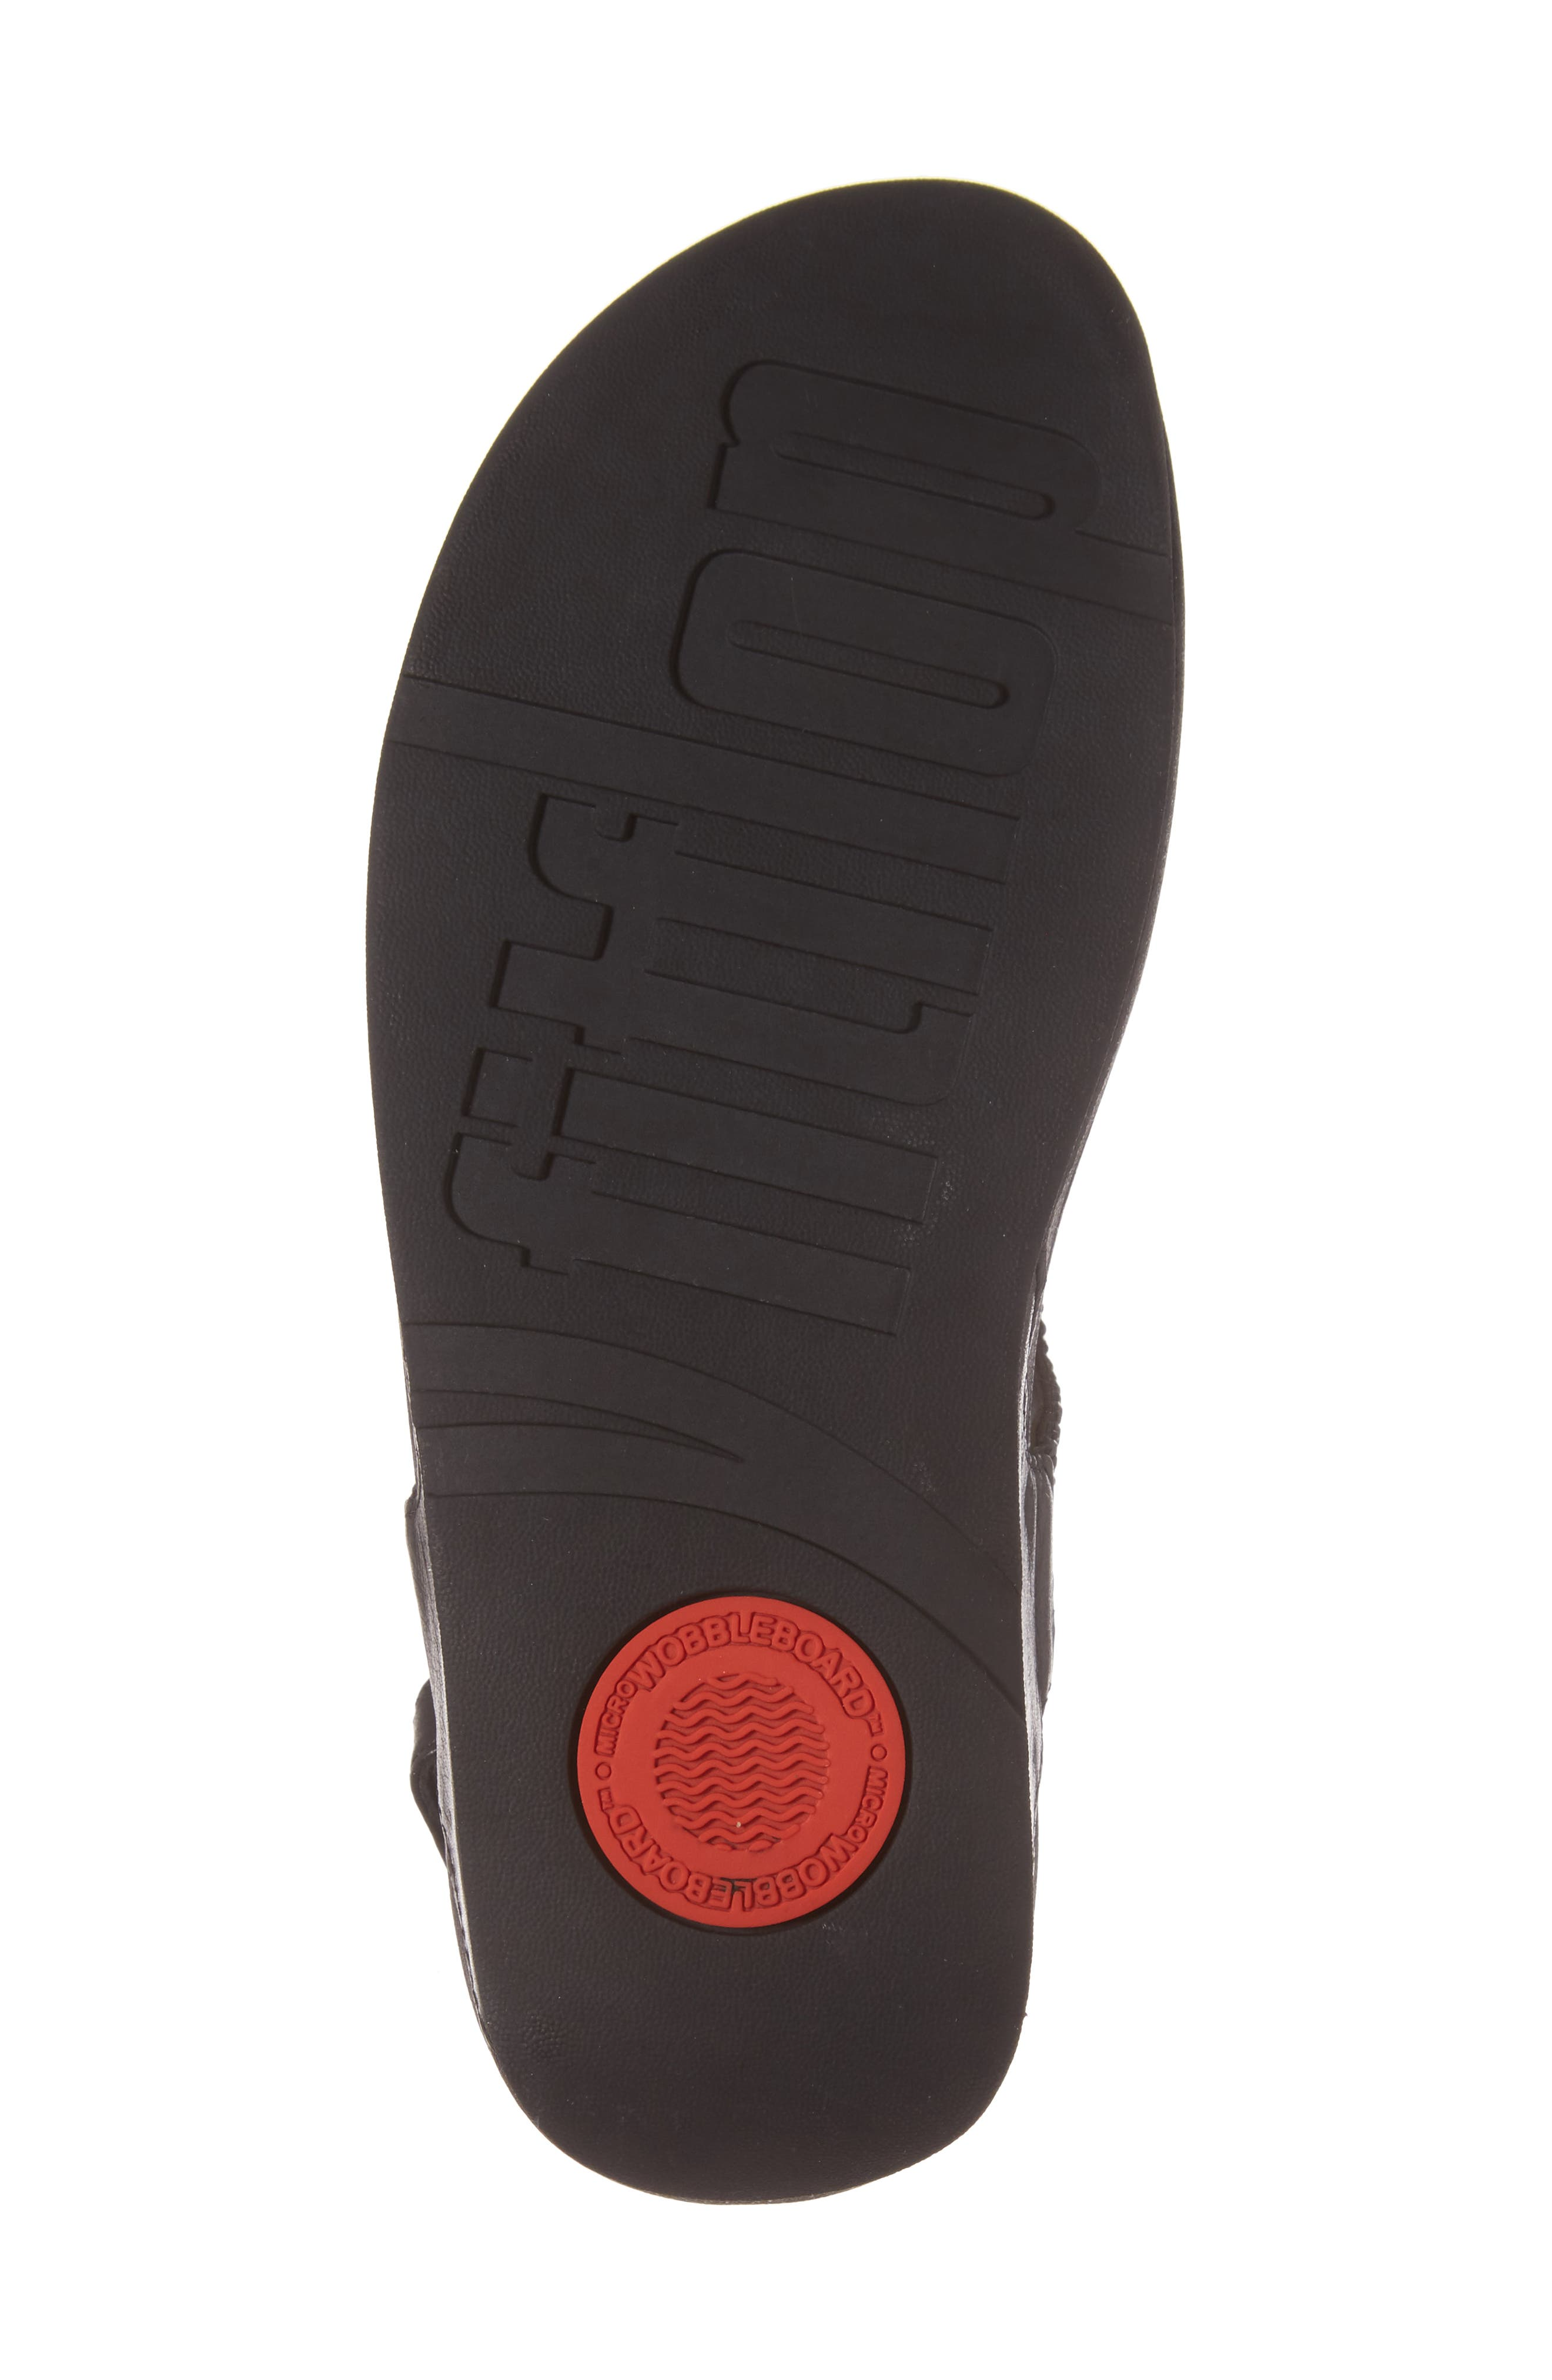 Bumble Crystal Embellished Sandal,                             Alternate thumbnail 6, color,                             Black Leather